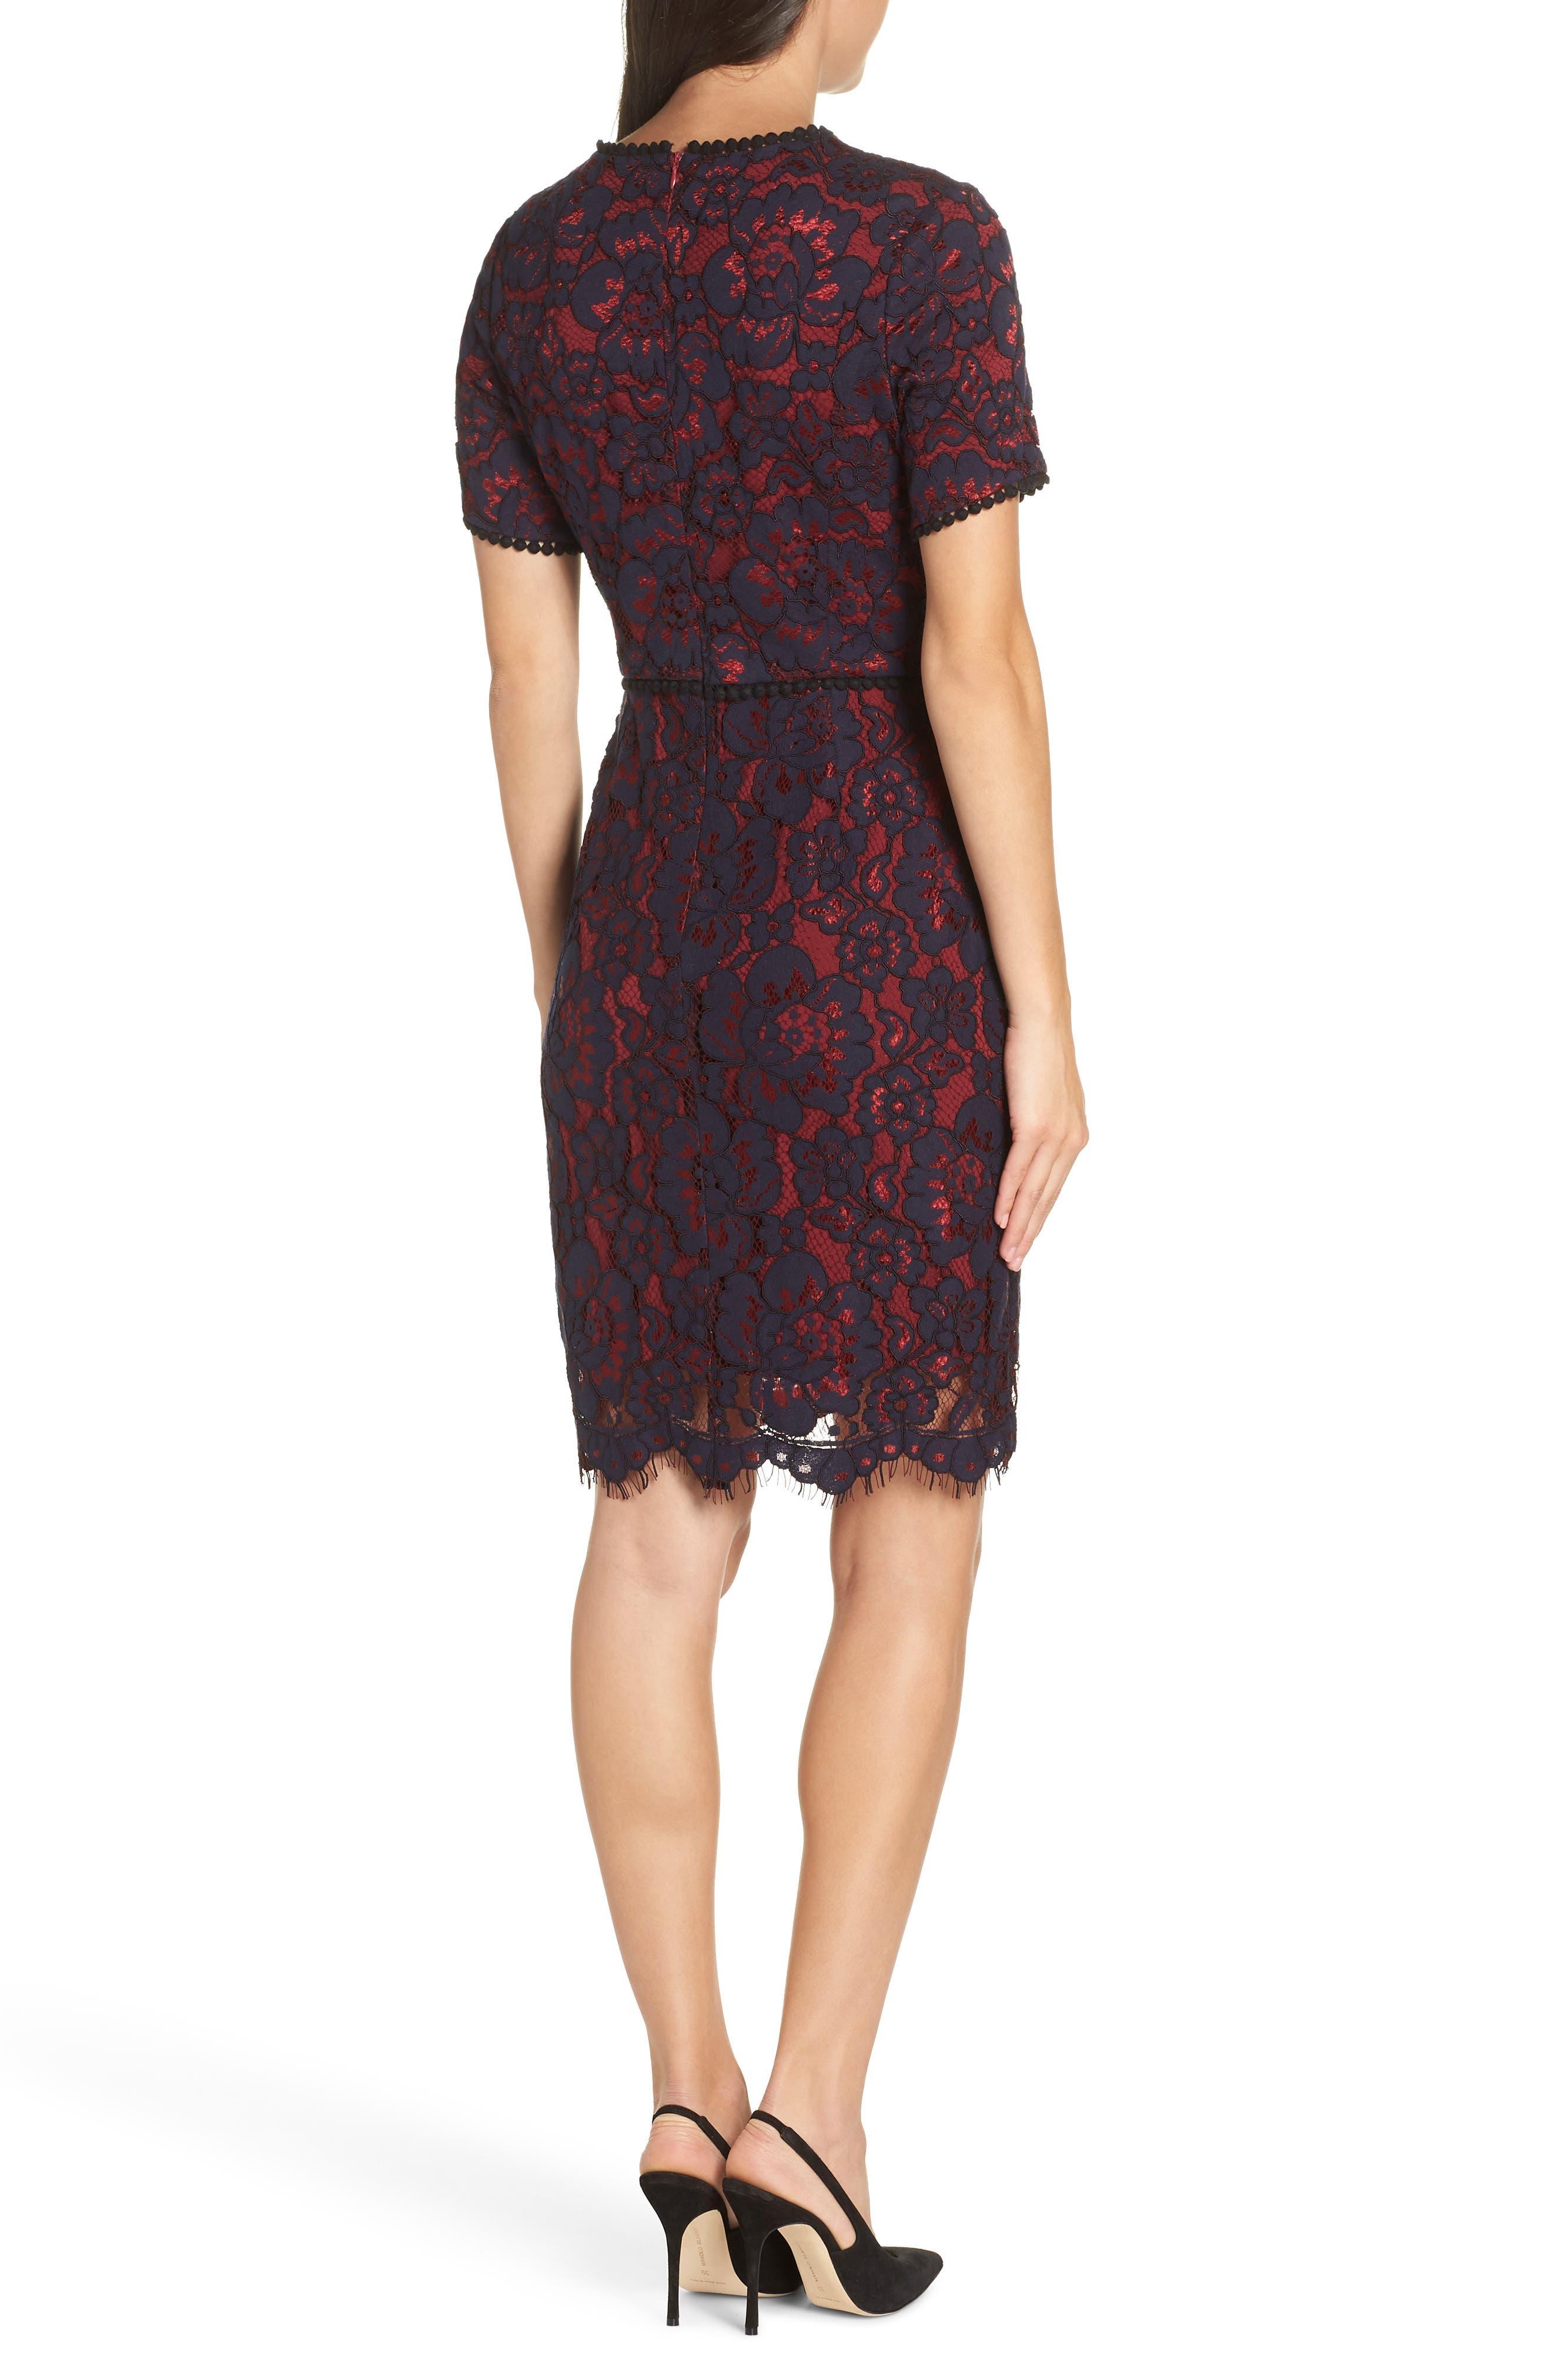 Lace Sheath Dress,                             Alternate thumbnail 2, color,                             NAVY/ WINE LACE